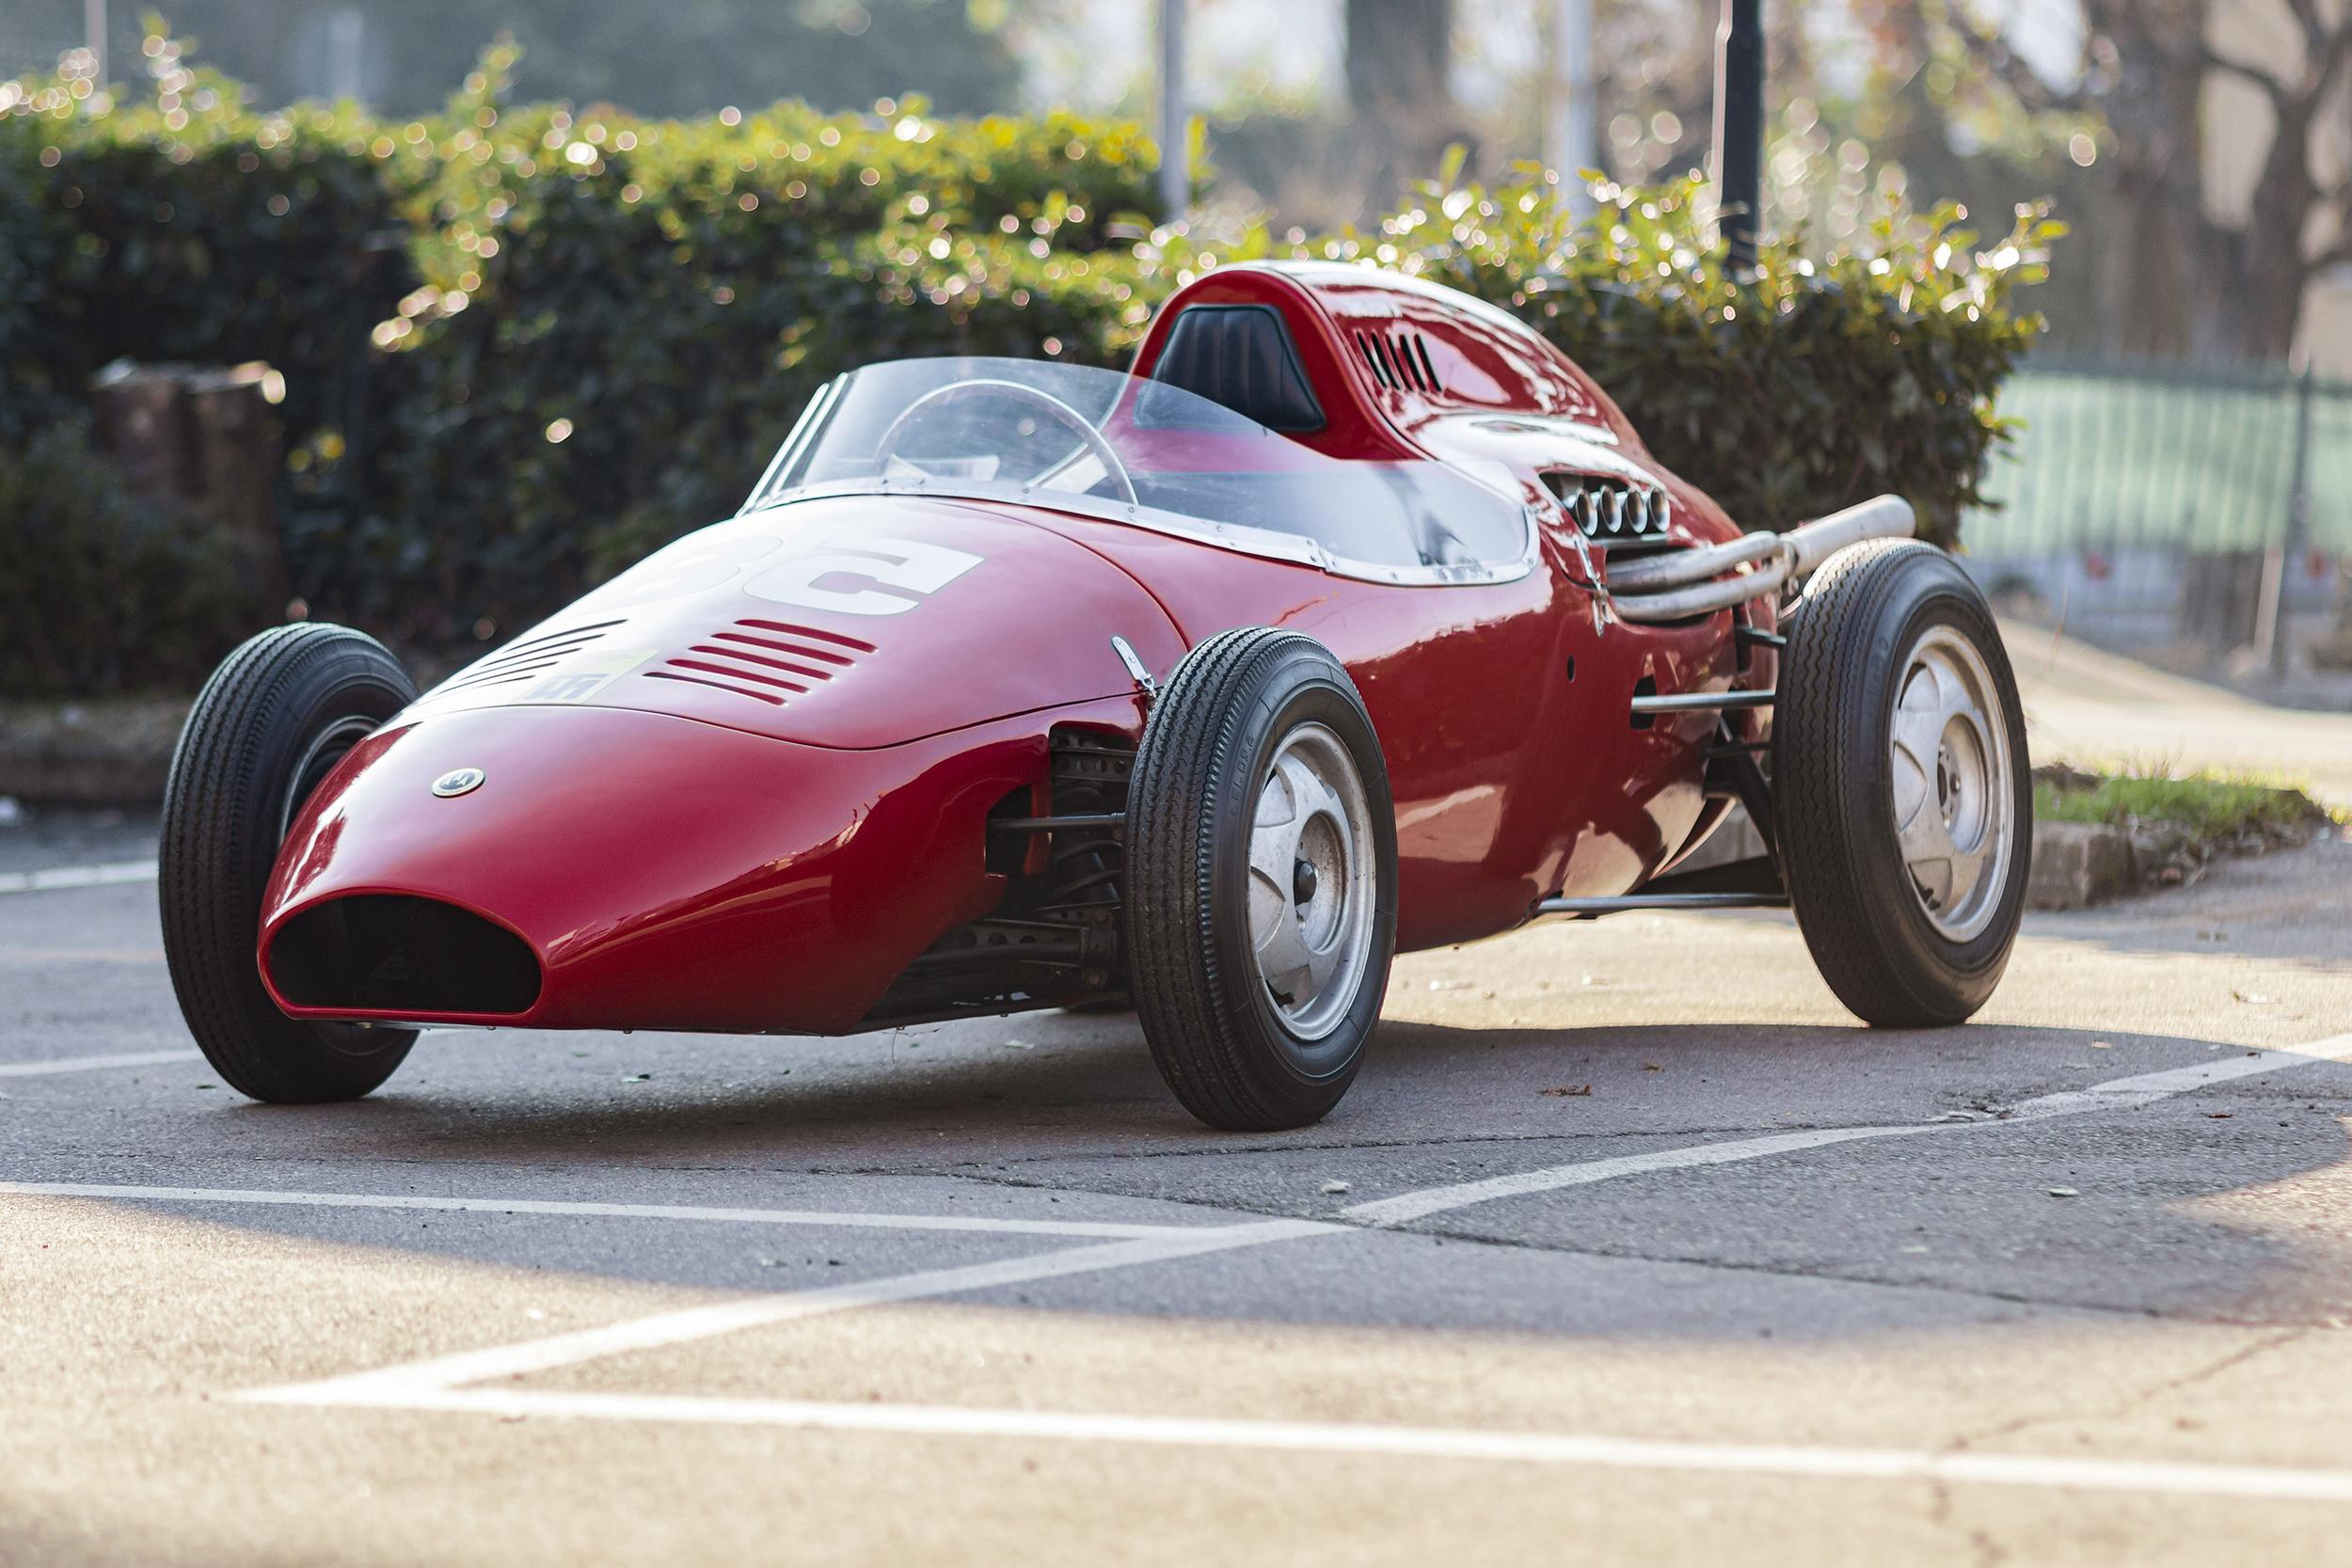 210219 1958 De Sanctis Formula Junior (Credit - Diana Varga ©2021 Courtesy of RM Sotheby's)